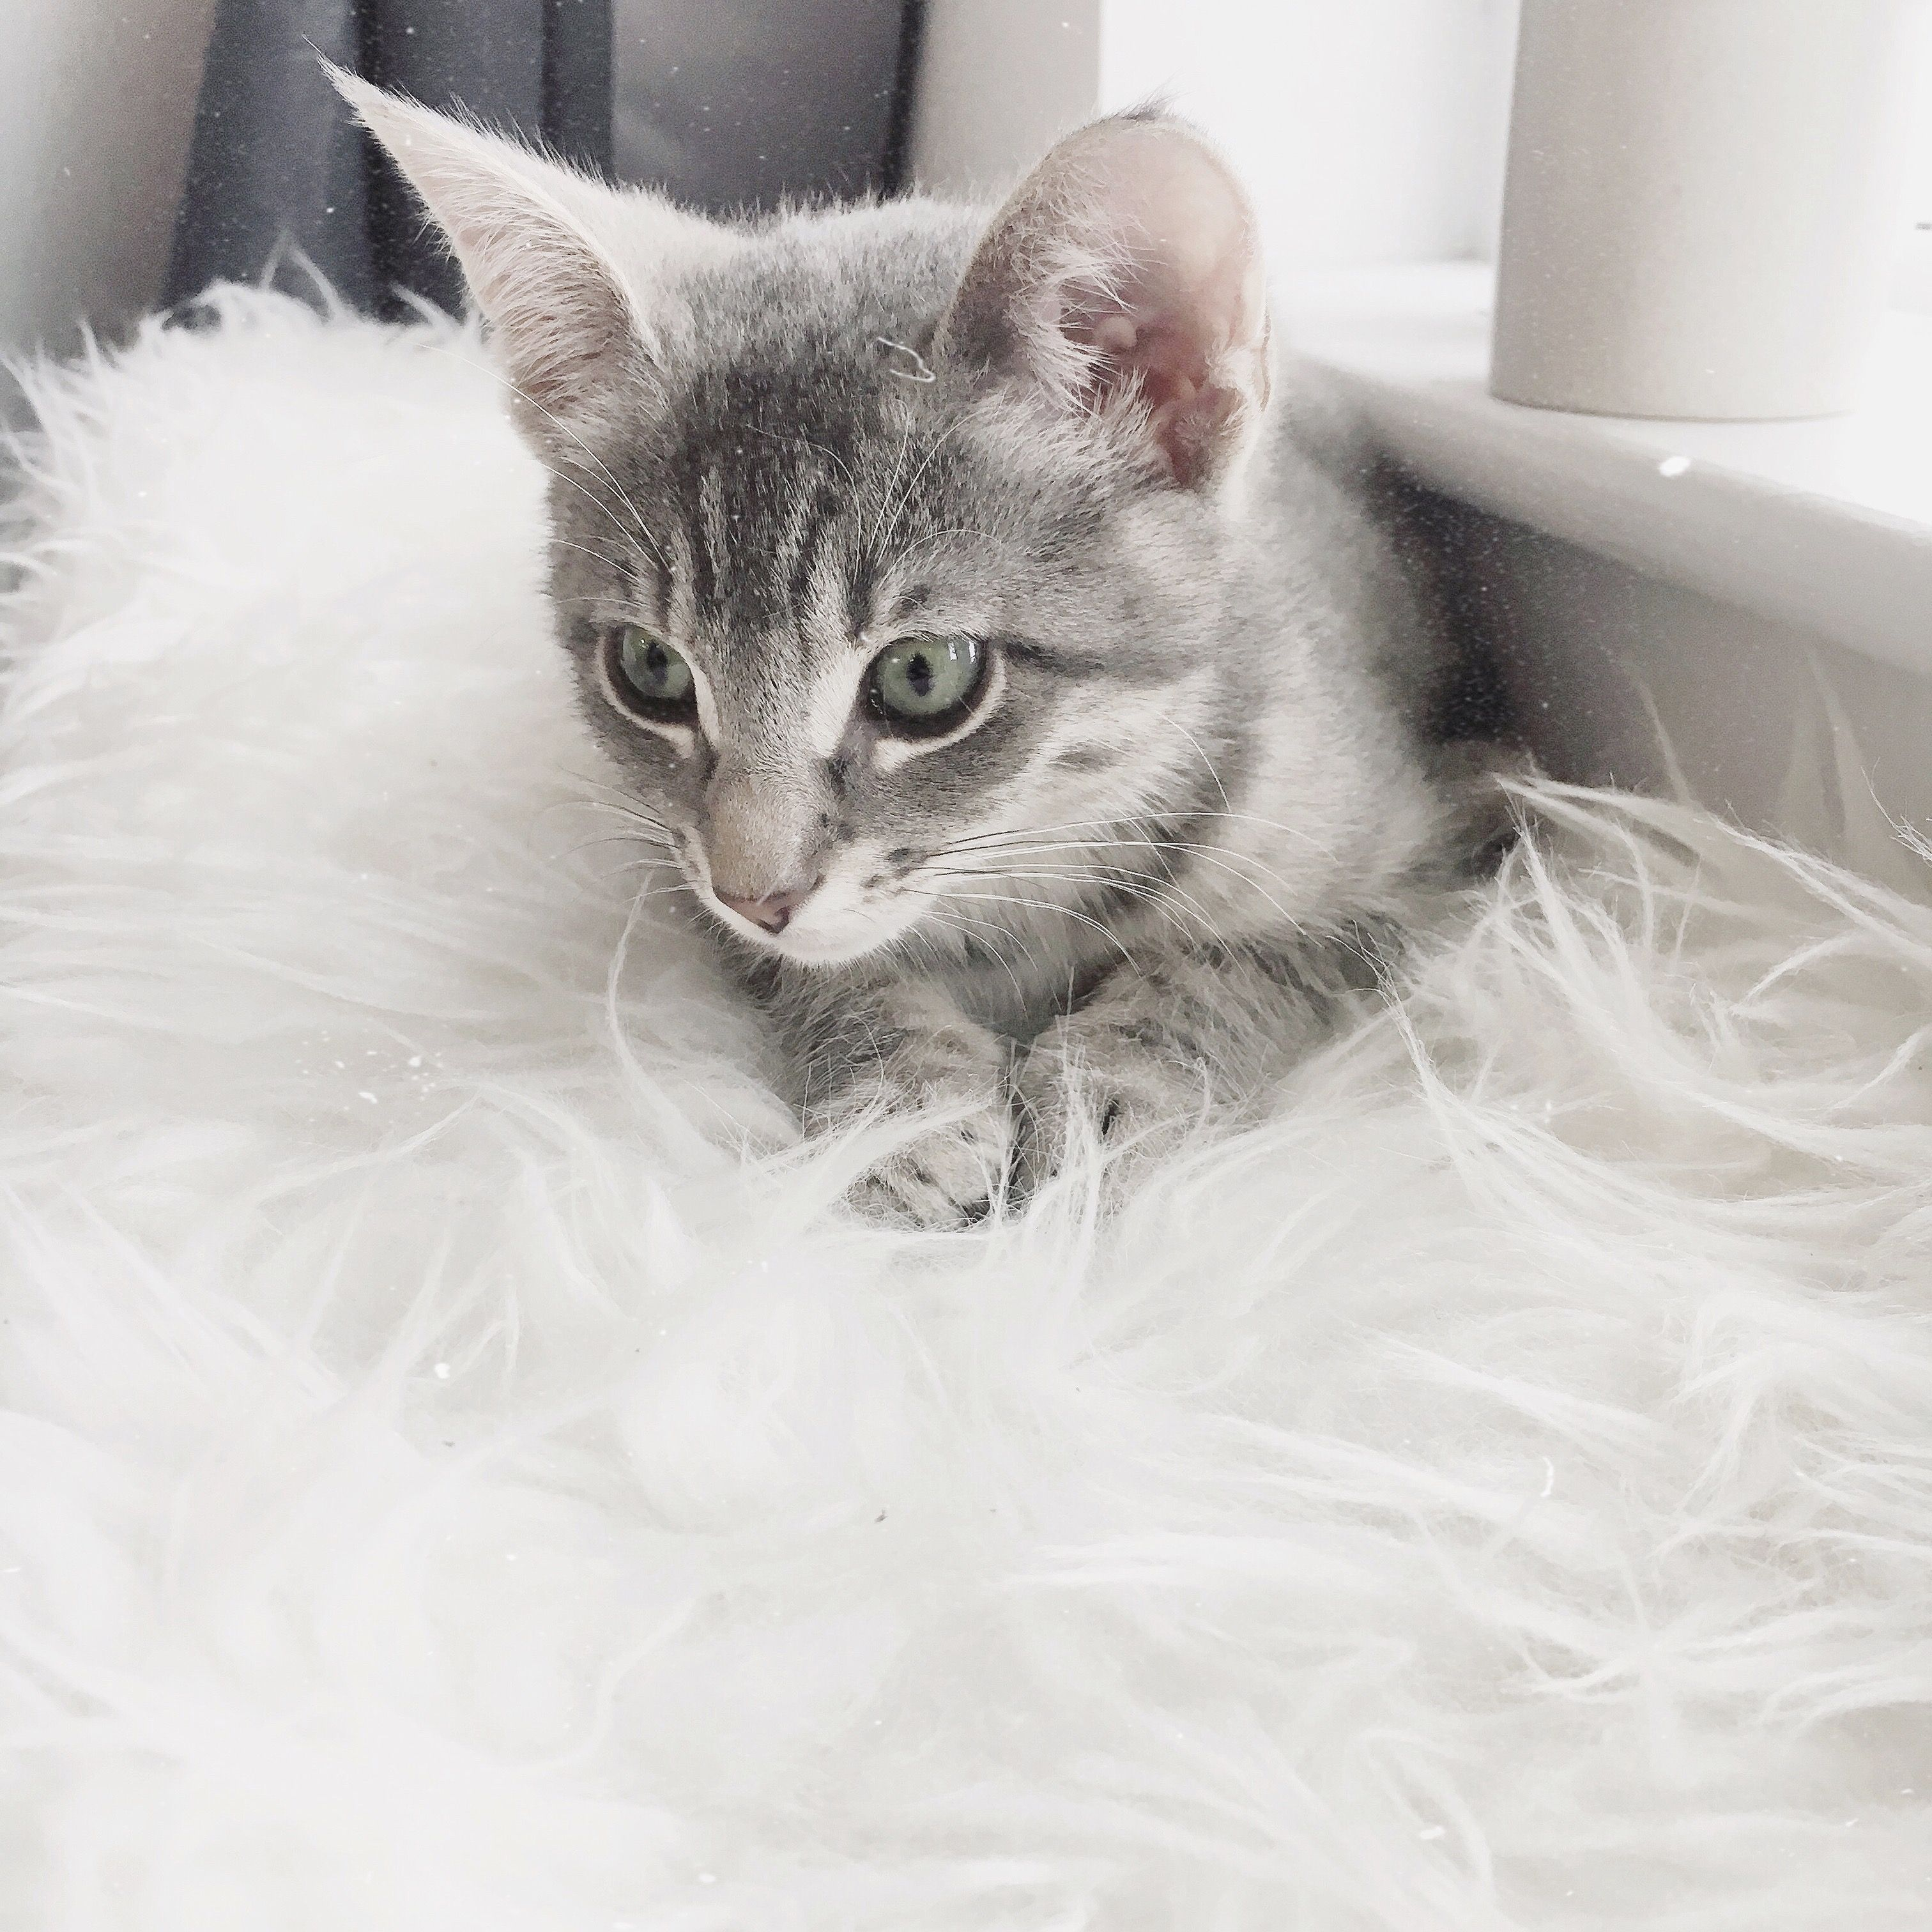 Mun Kitten Kittens Green Eyes Domestic Short Hair Cat Light Grey Blue Silver Tabby Baby Cute Fluff Kittens Cutest Grey Kitten Grey Tabby Cats